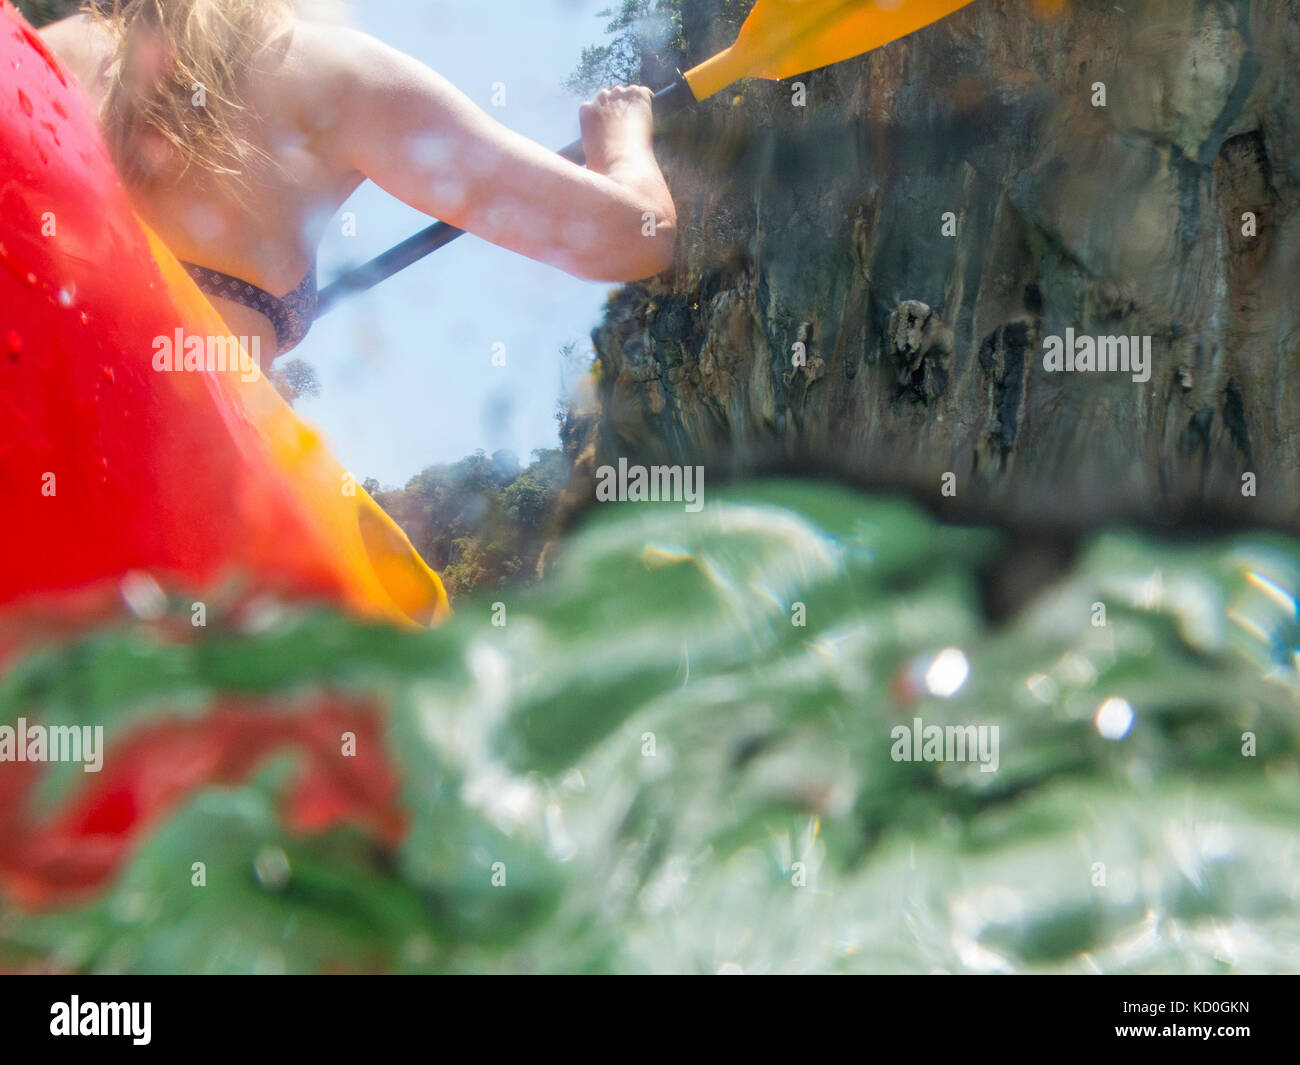 Ansicht der Rückseite Frau Sea Kayaking, Ko Hong, Thailand, Asien Stockbild